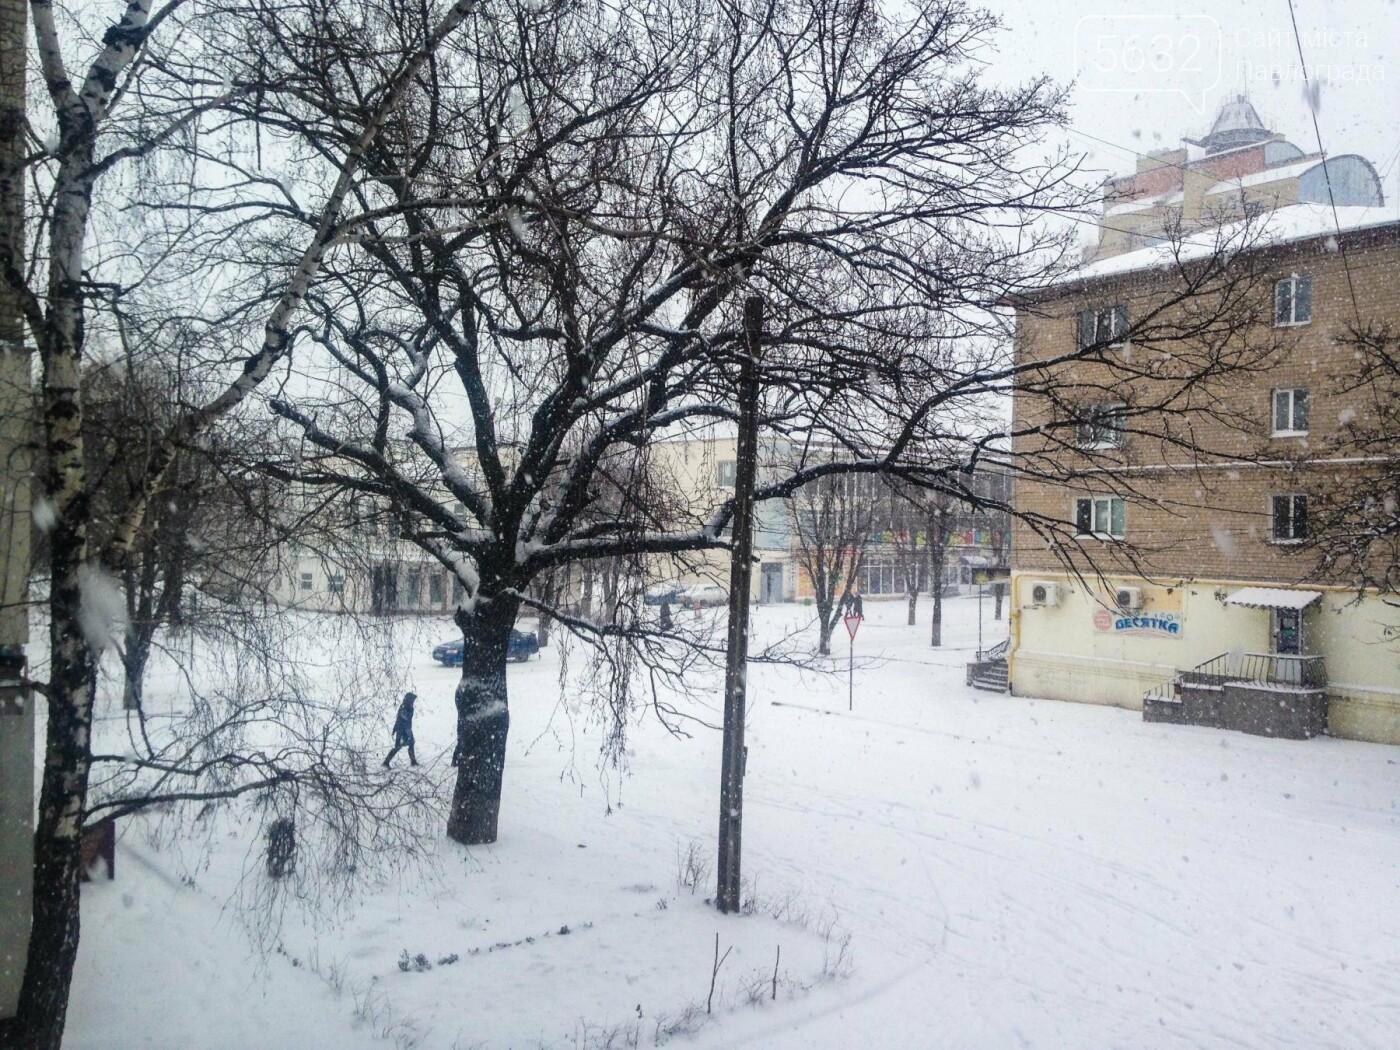 В Павлоград пришла зима: город накрыло снегом, фото-1